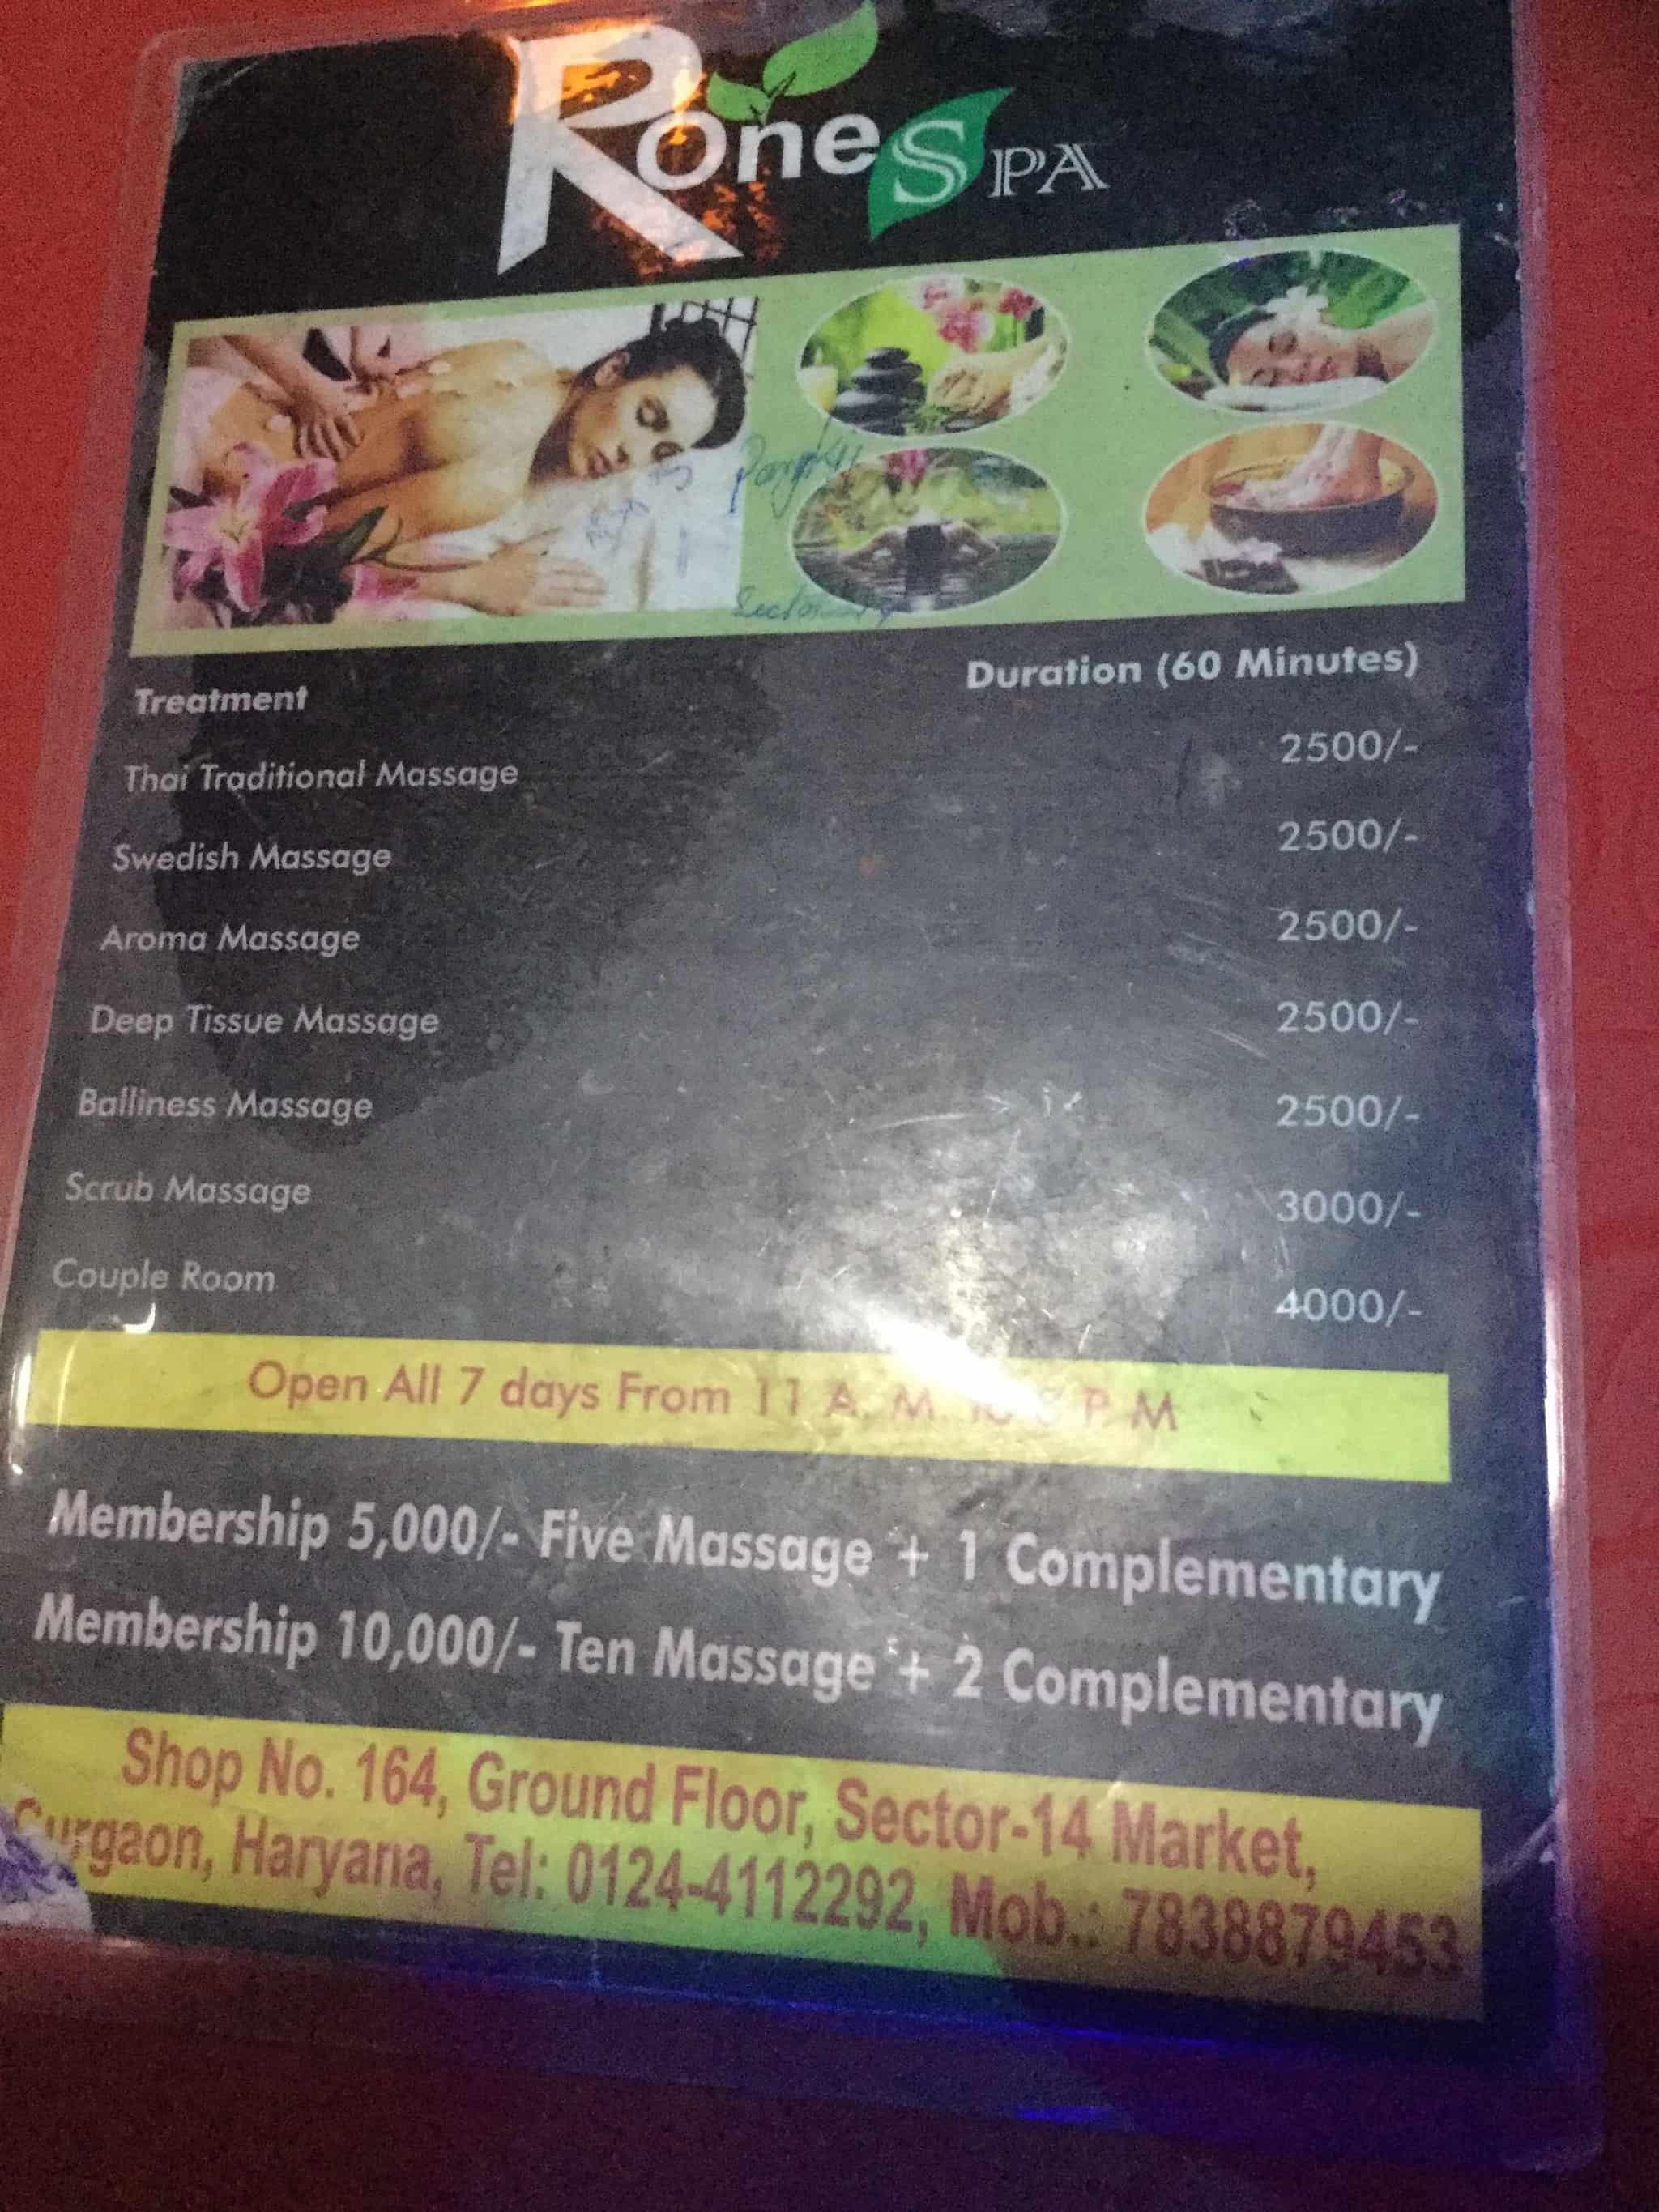 Rone Spa Gurgaon Sector 14 Body Massage Centres In Gurgaon